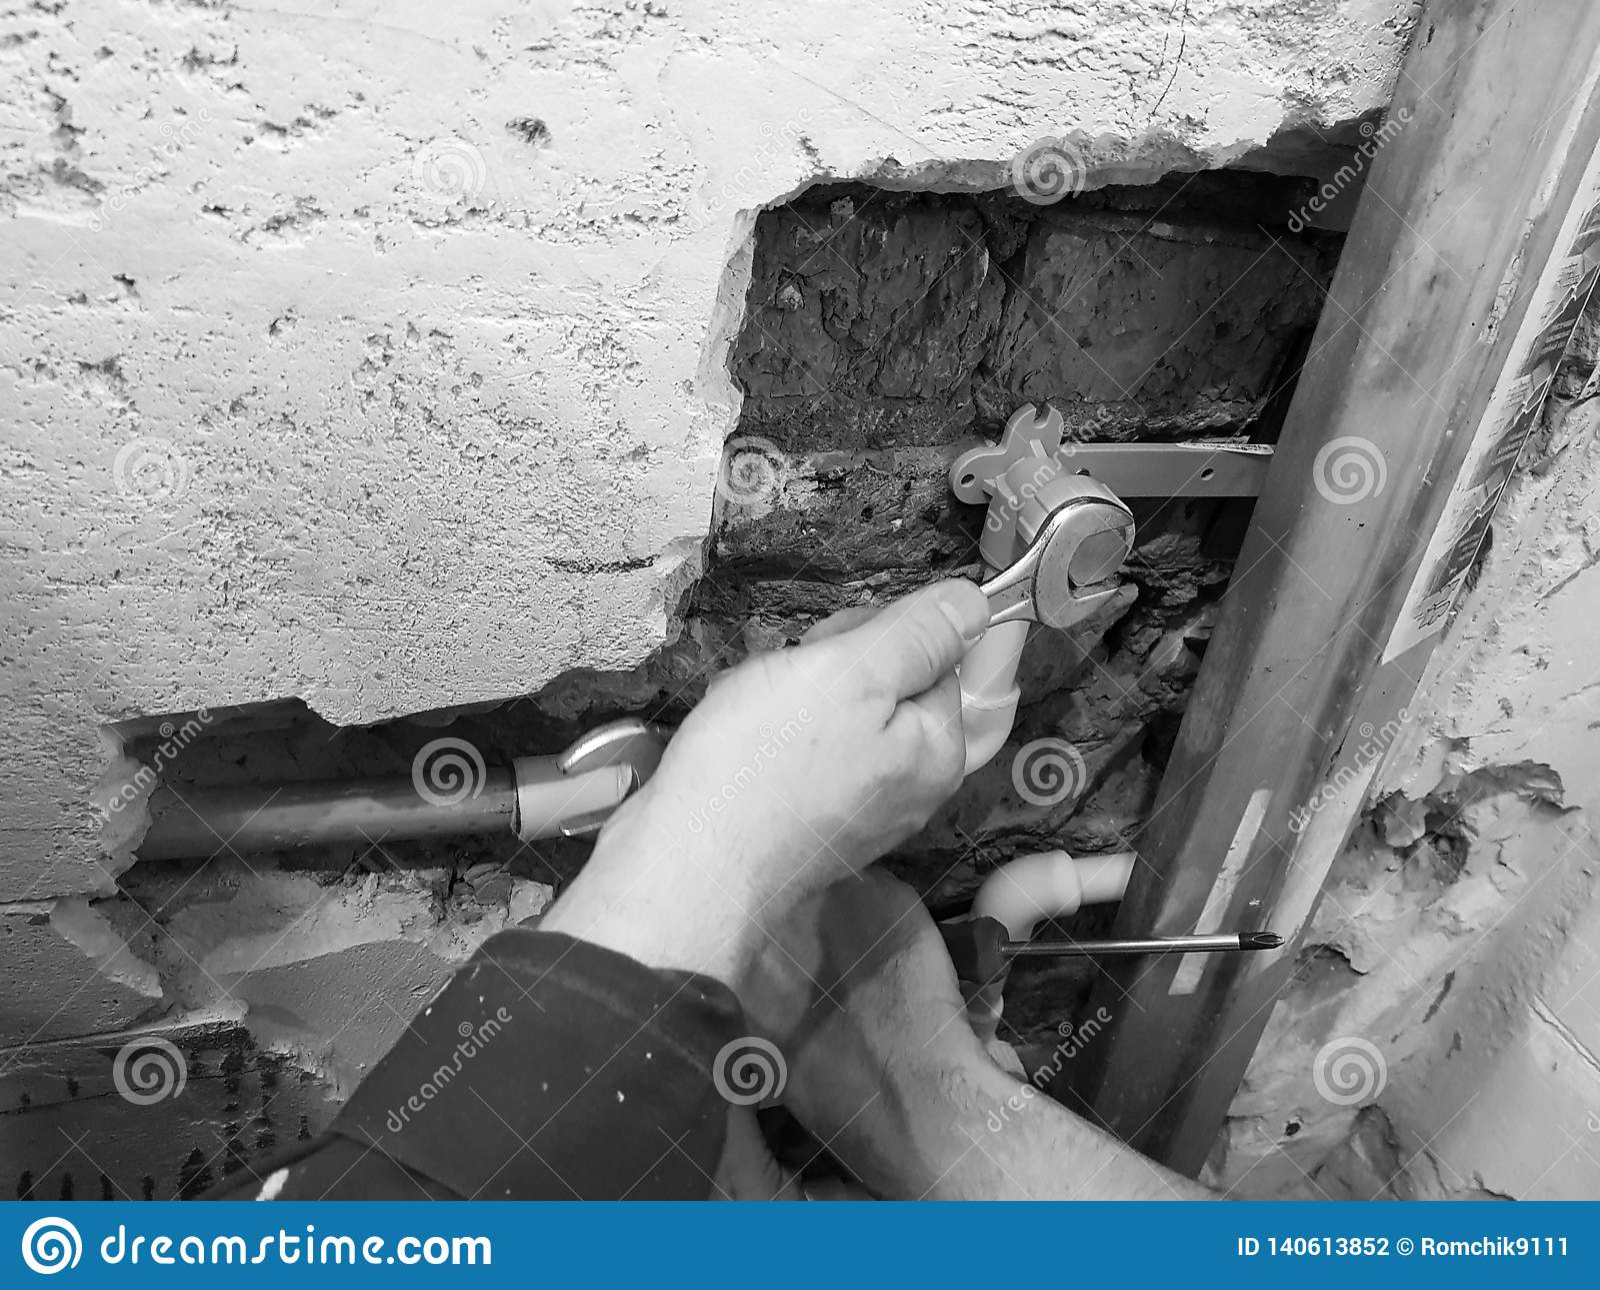 Труба и ворота пропилена в кирпичной стене - заварке пропилена